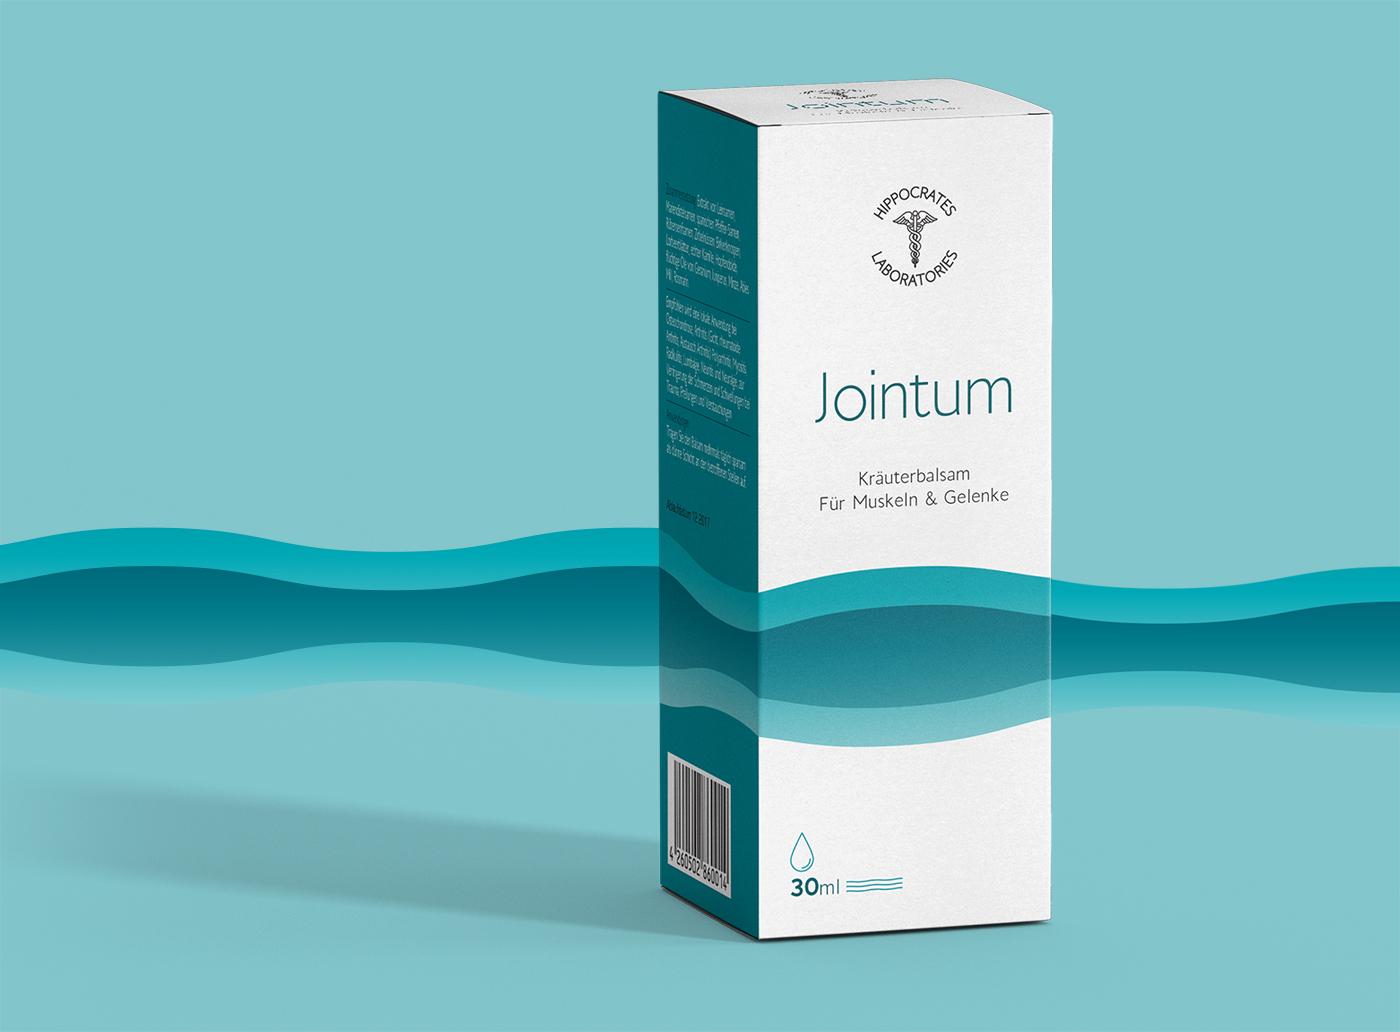 jontium_balsam_box_1400px